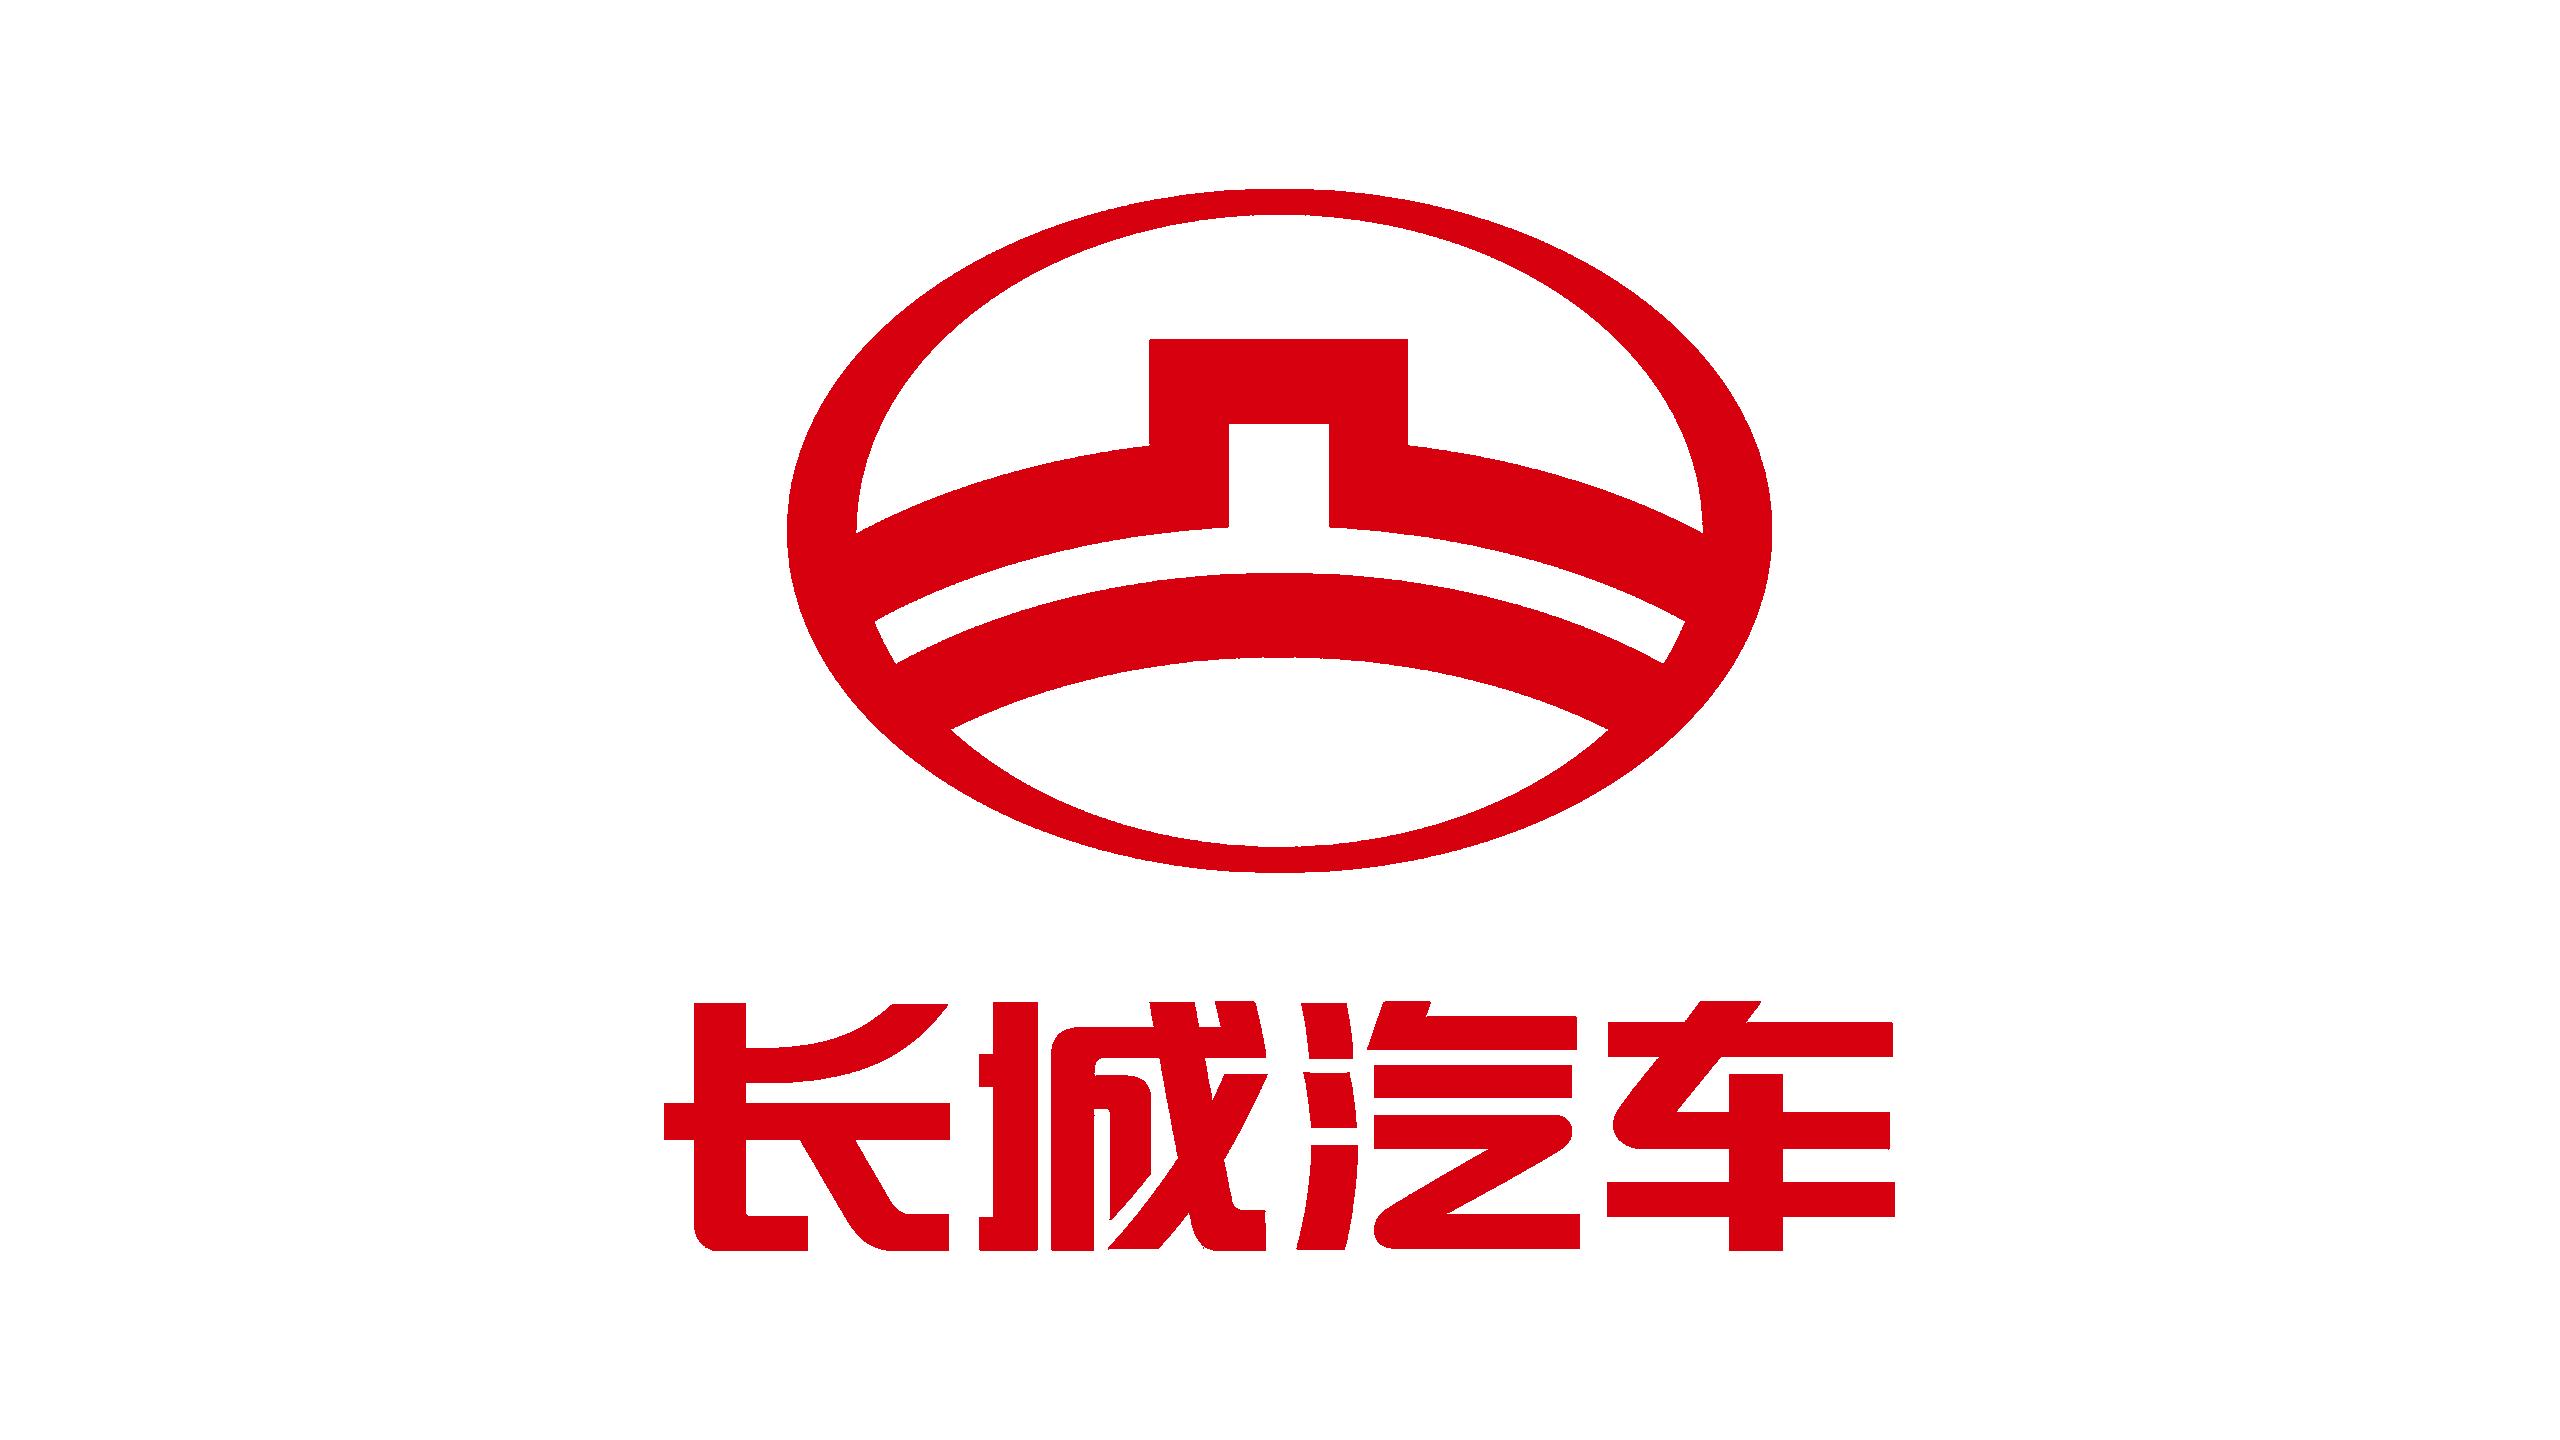 Great Wall Logo Hd Png Meaning Information Carlogos